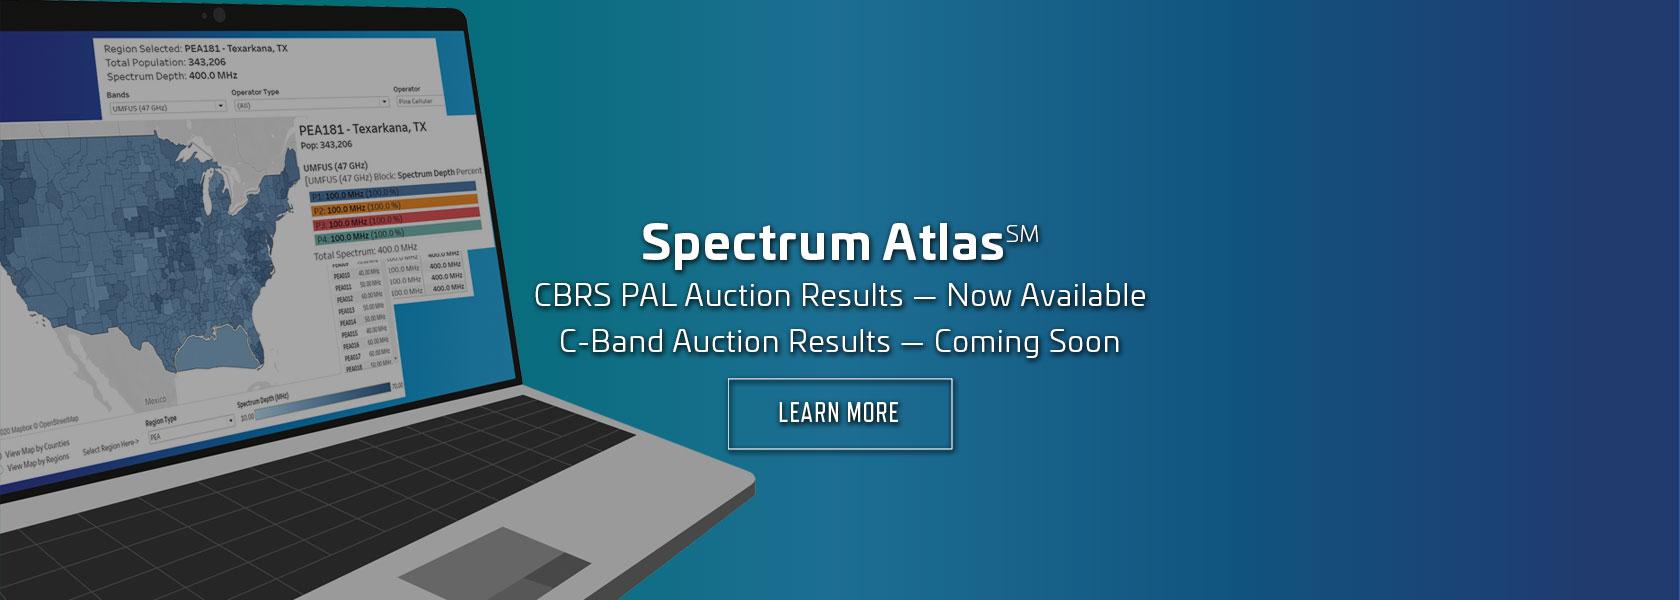 Spectrum Atlas